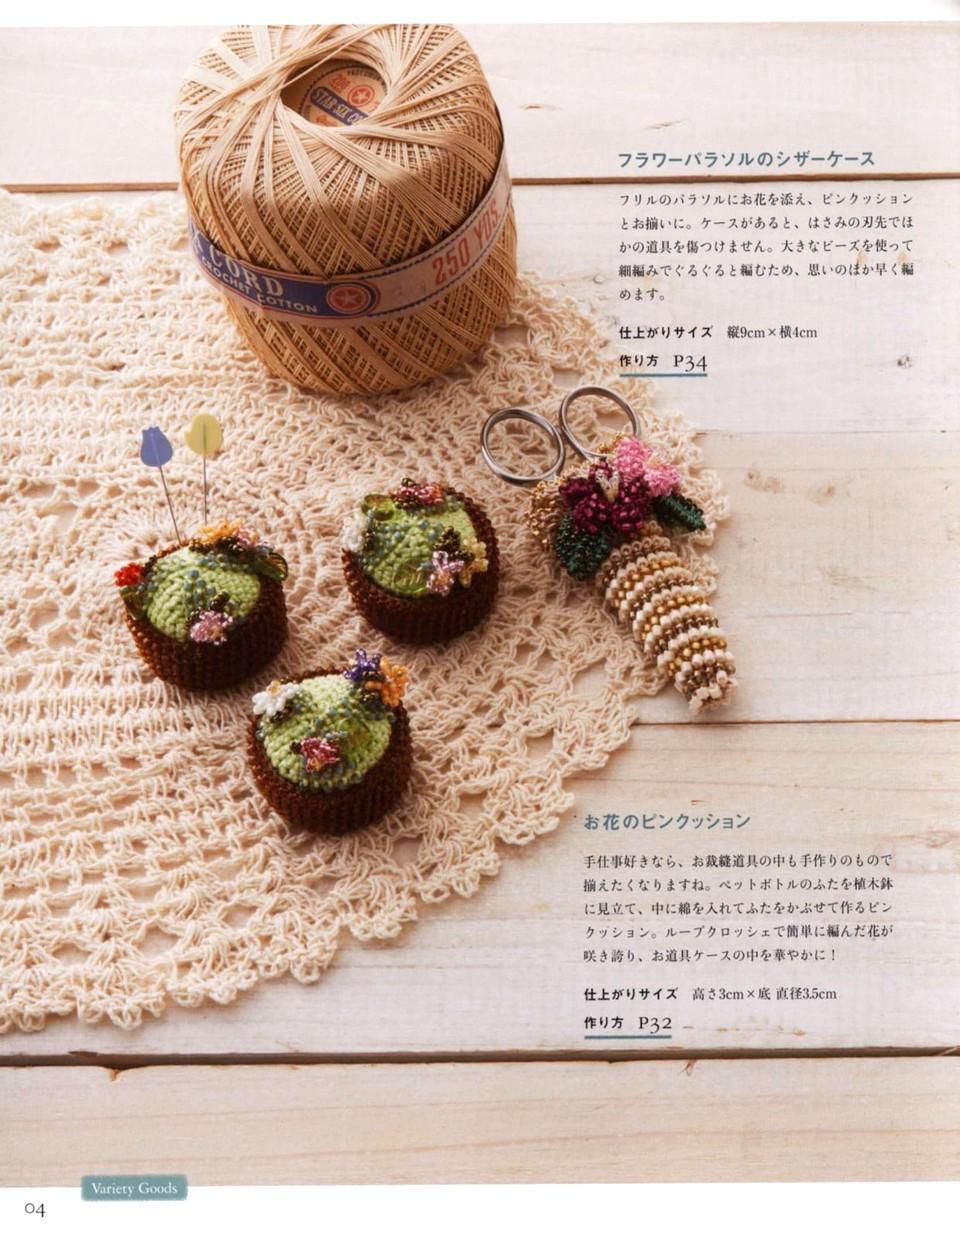 717 Beads Crochet 17-05